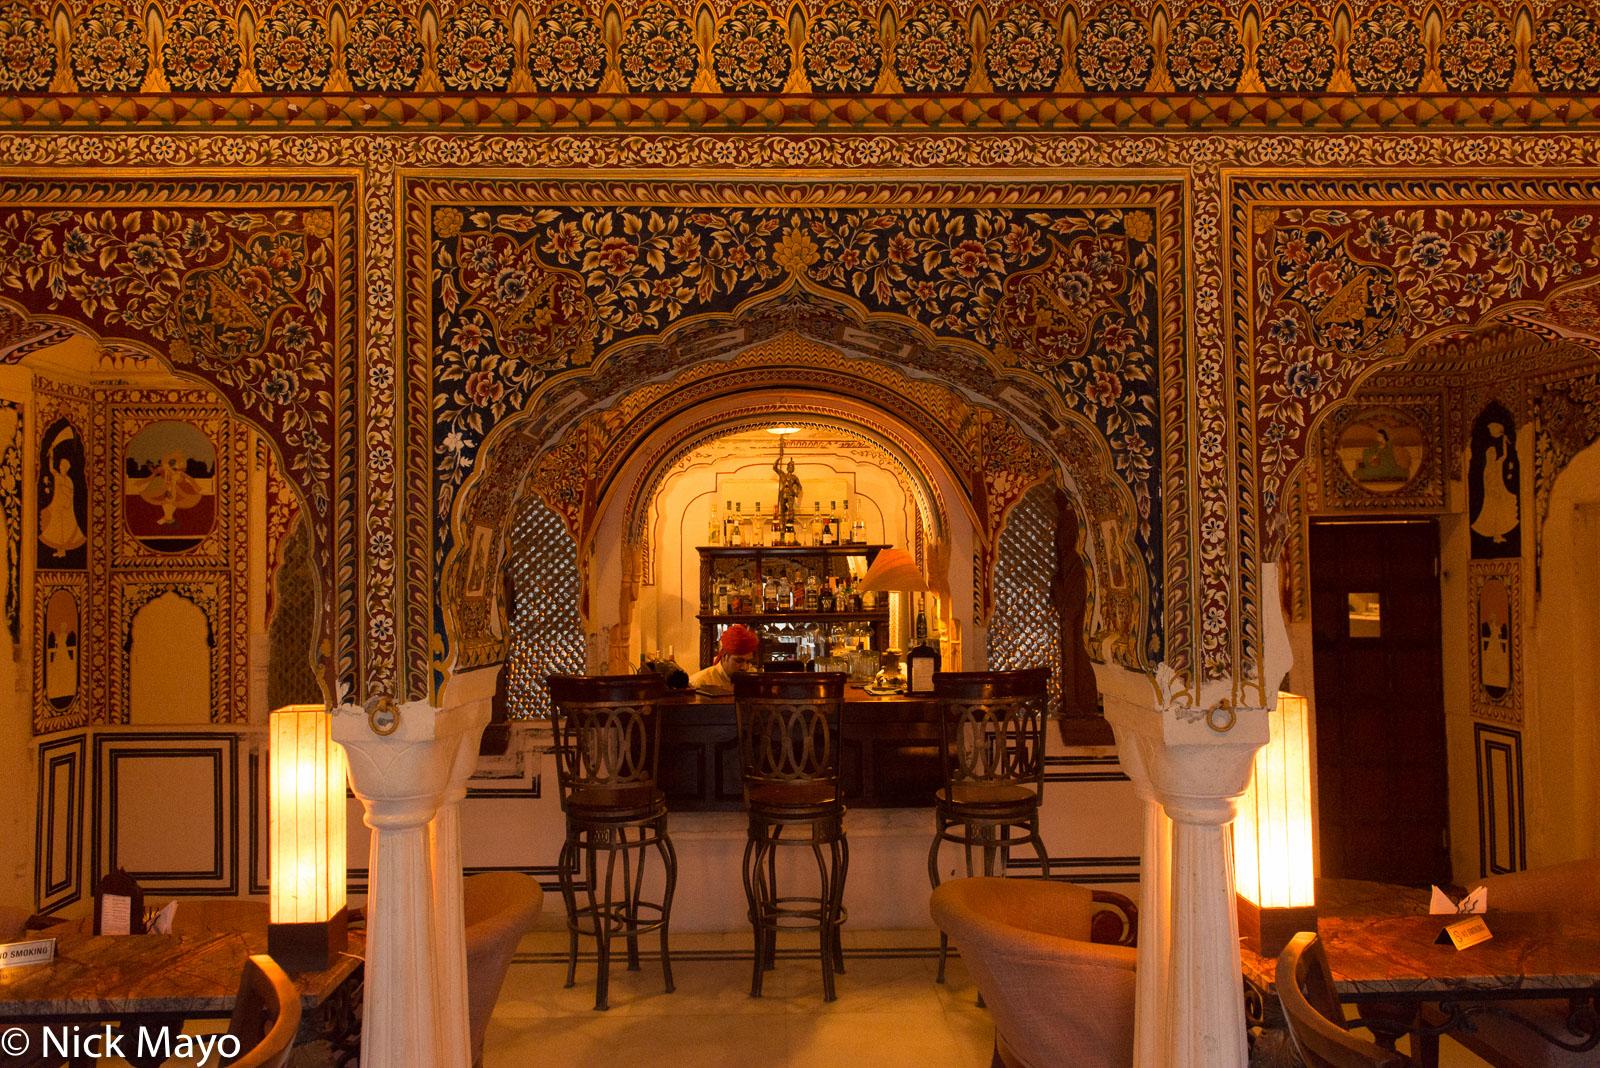 Bar, India, Mural, Rajasthan, photo